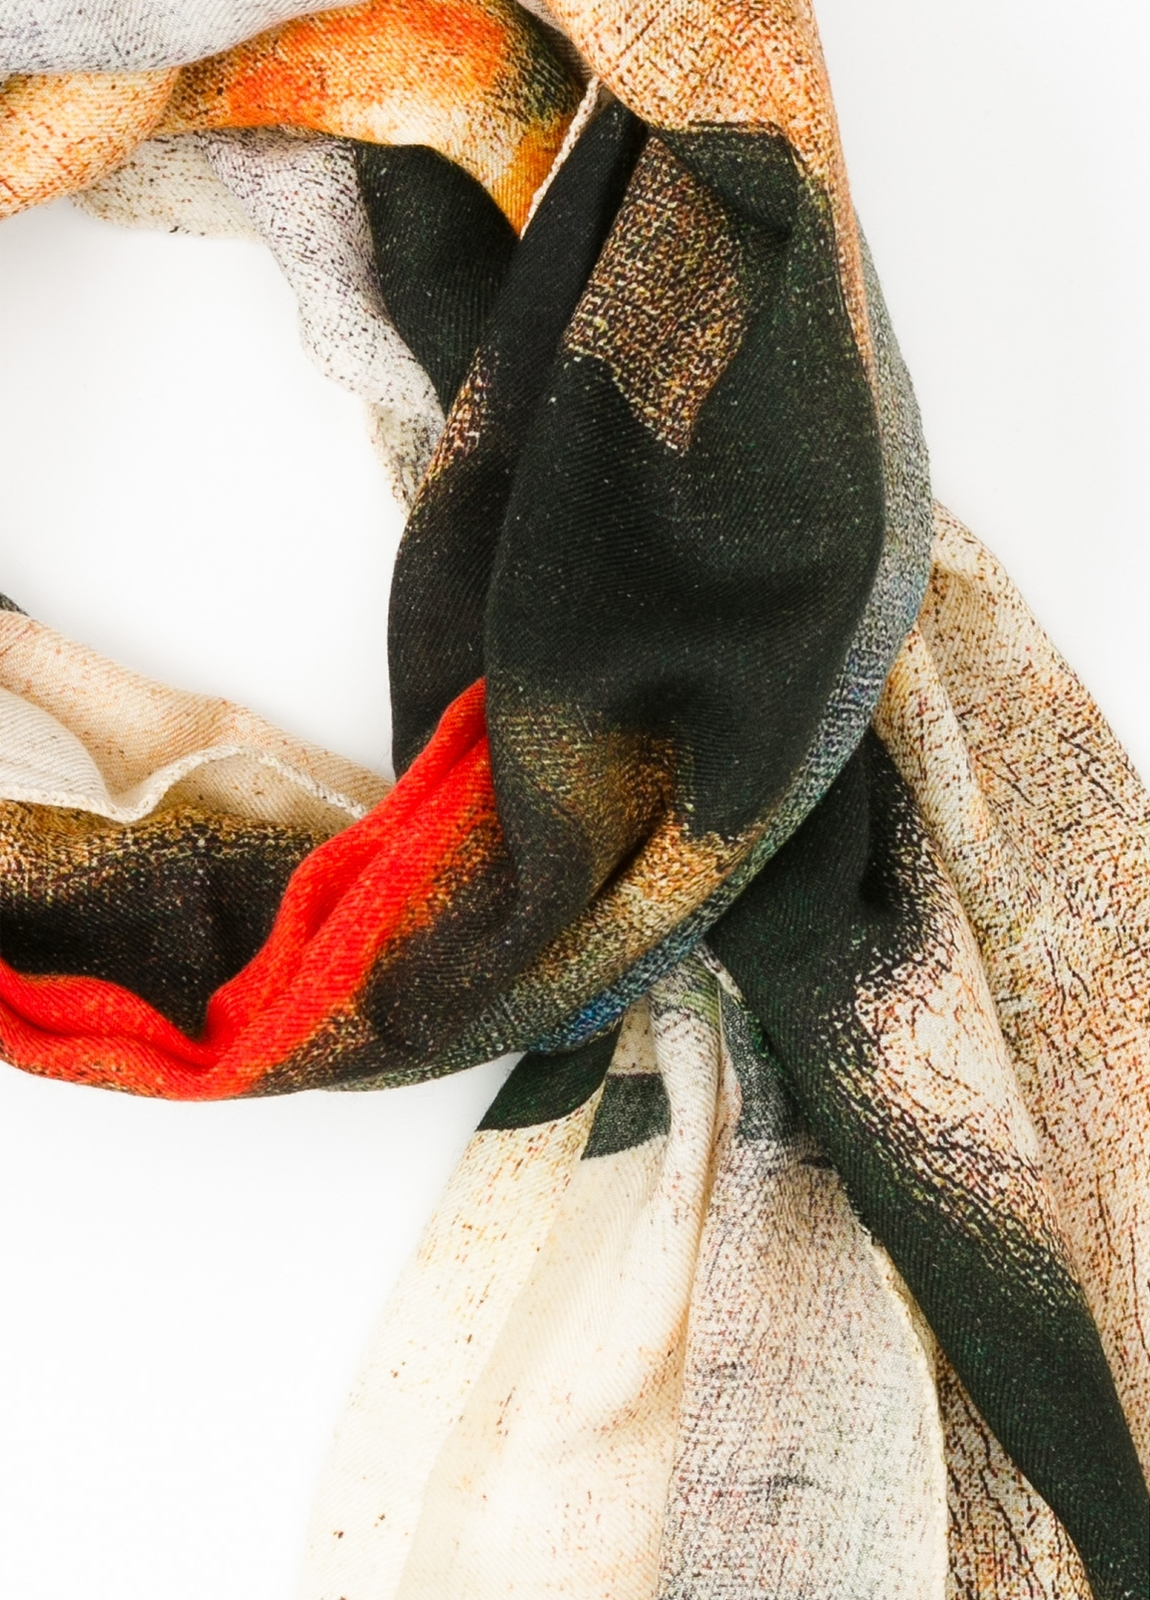 Foulard estampado abstracto color crudo, 70 x 200 cm. 100% Lana. - Ítem1